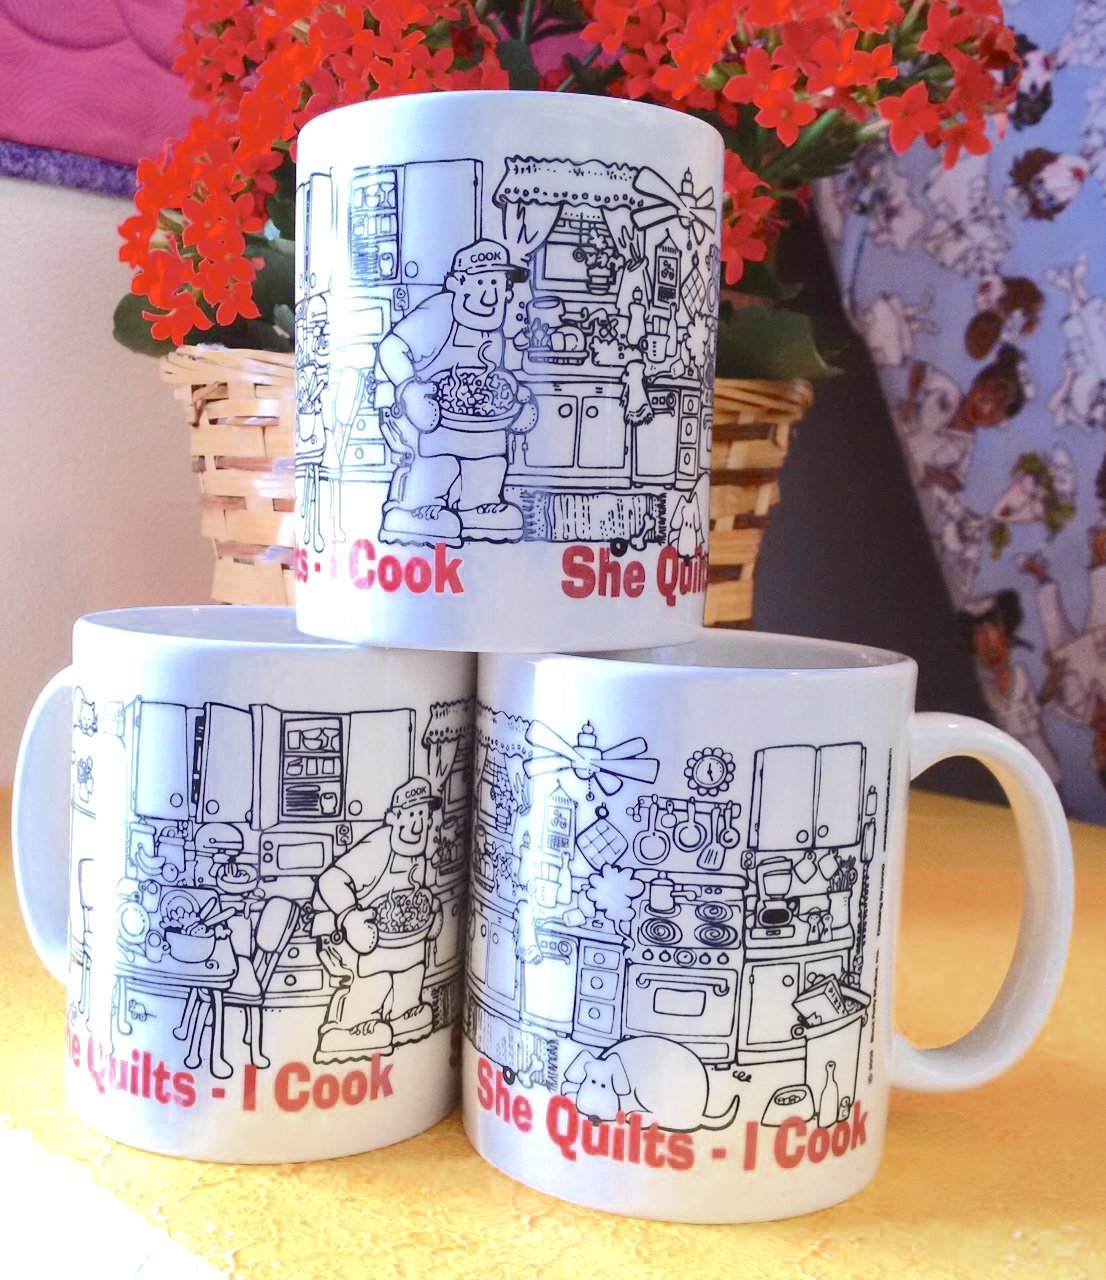 She Quilts - I Cook Mug